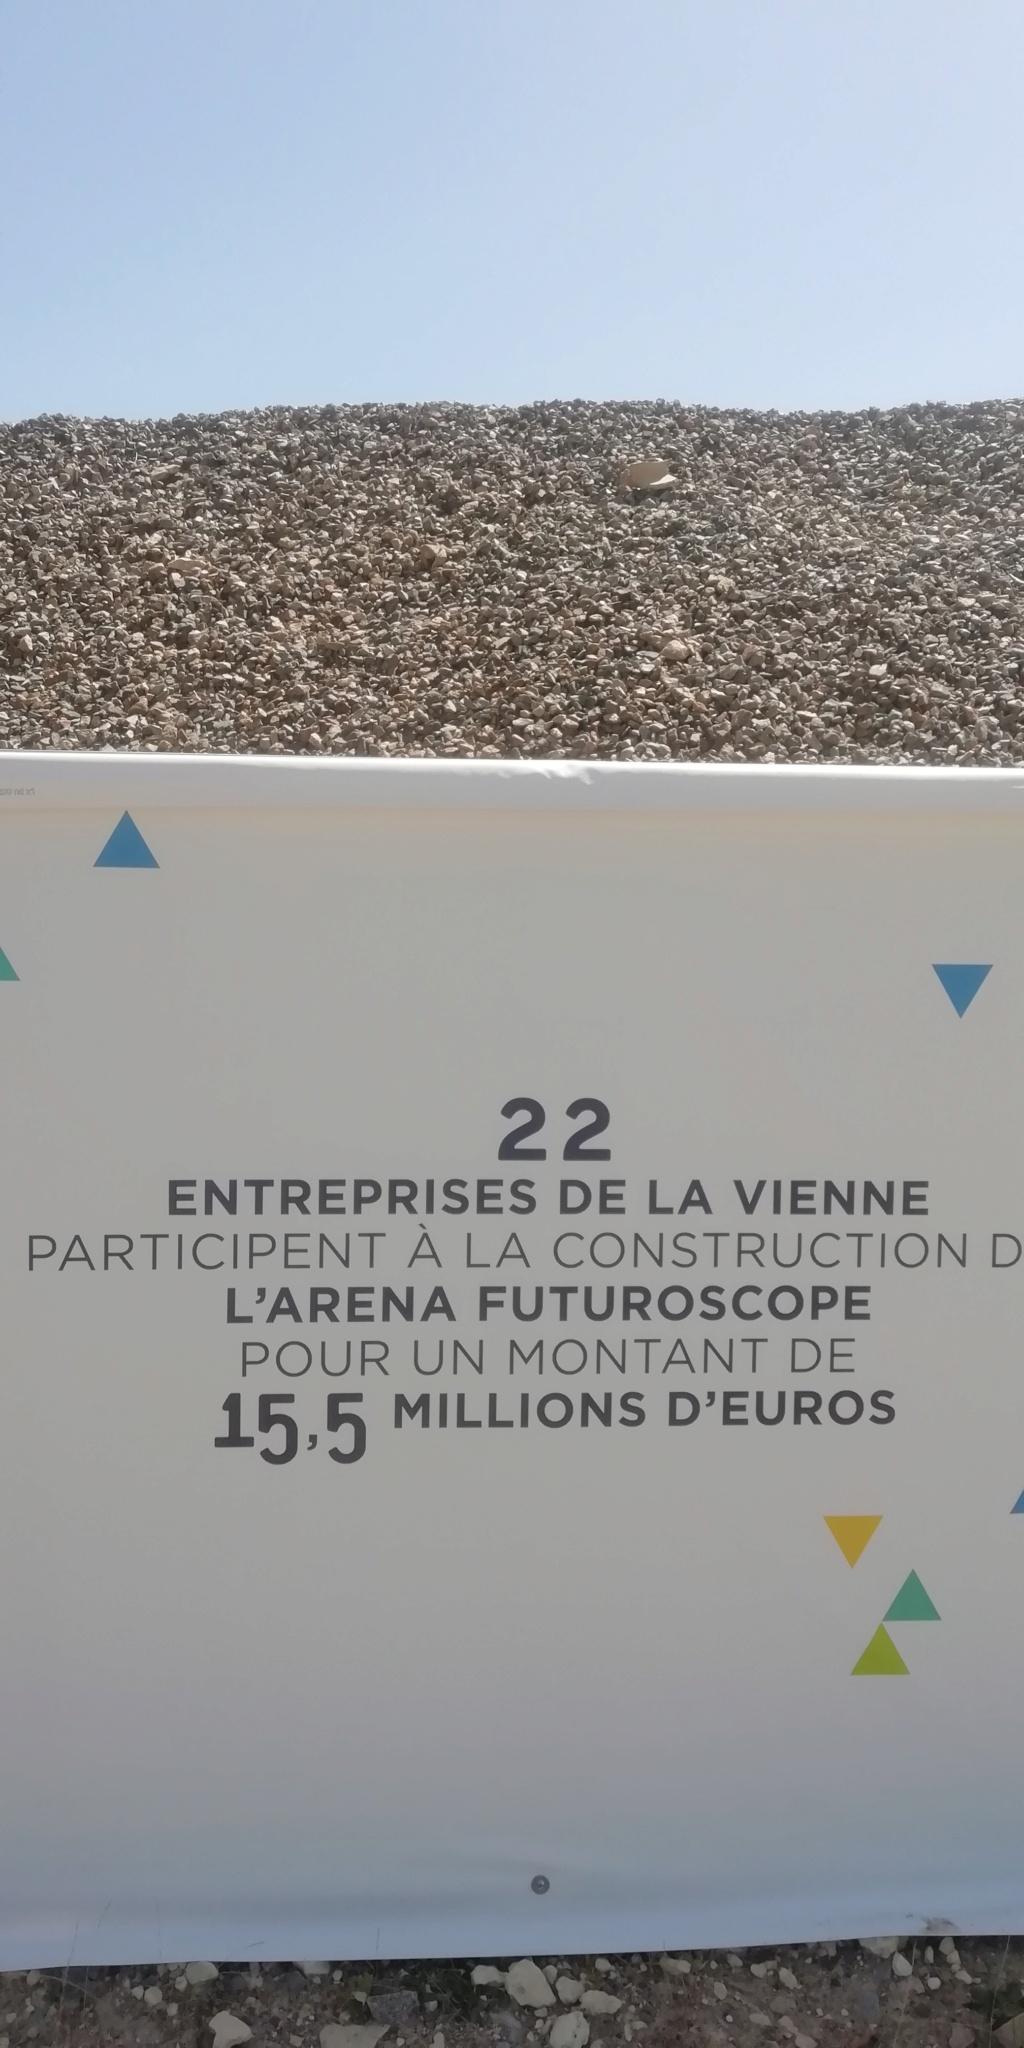 « Arena Futuroscope » grande salle de spectacles et de sports · 2022 - Page 11 Img_2017